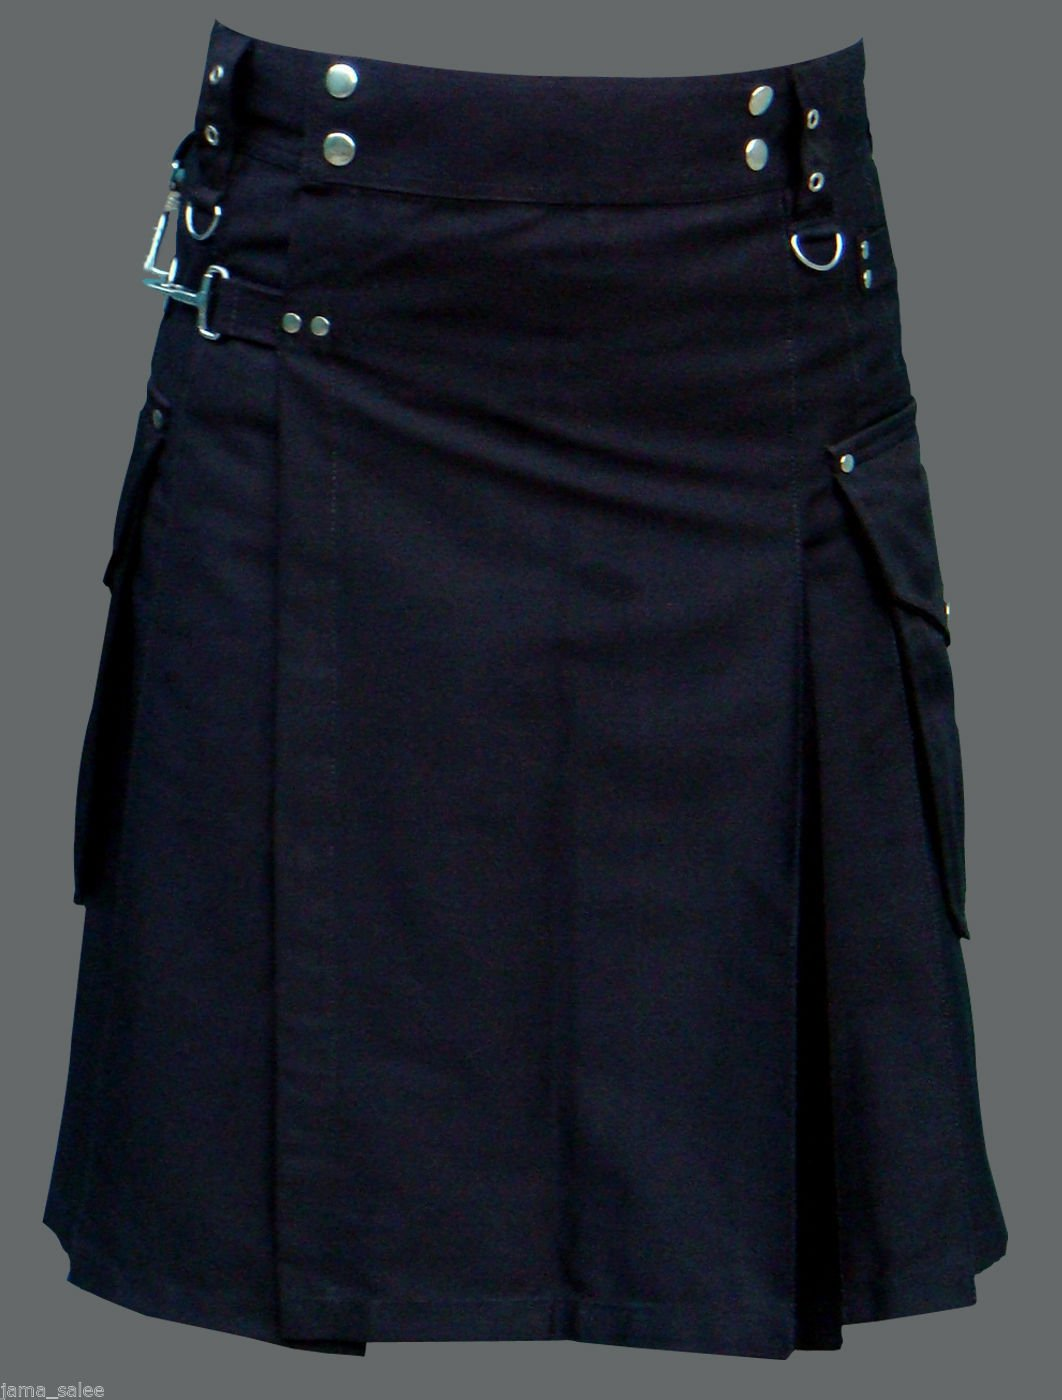 Men 56 Waist Handmade Black Deluxe Utility Kilt 100% Cotton With Cargo Pockets